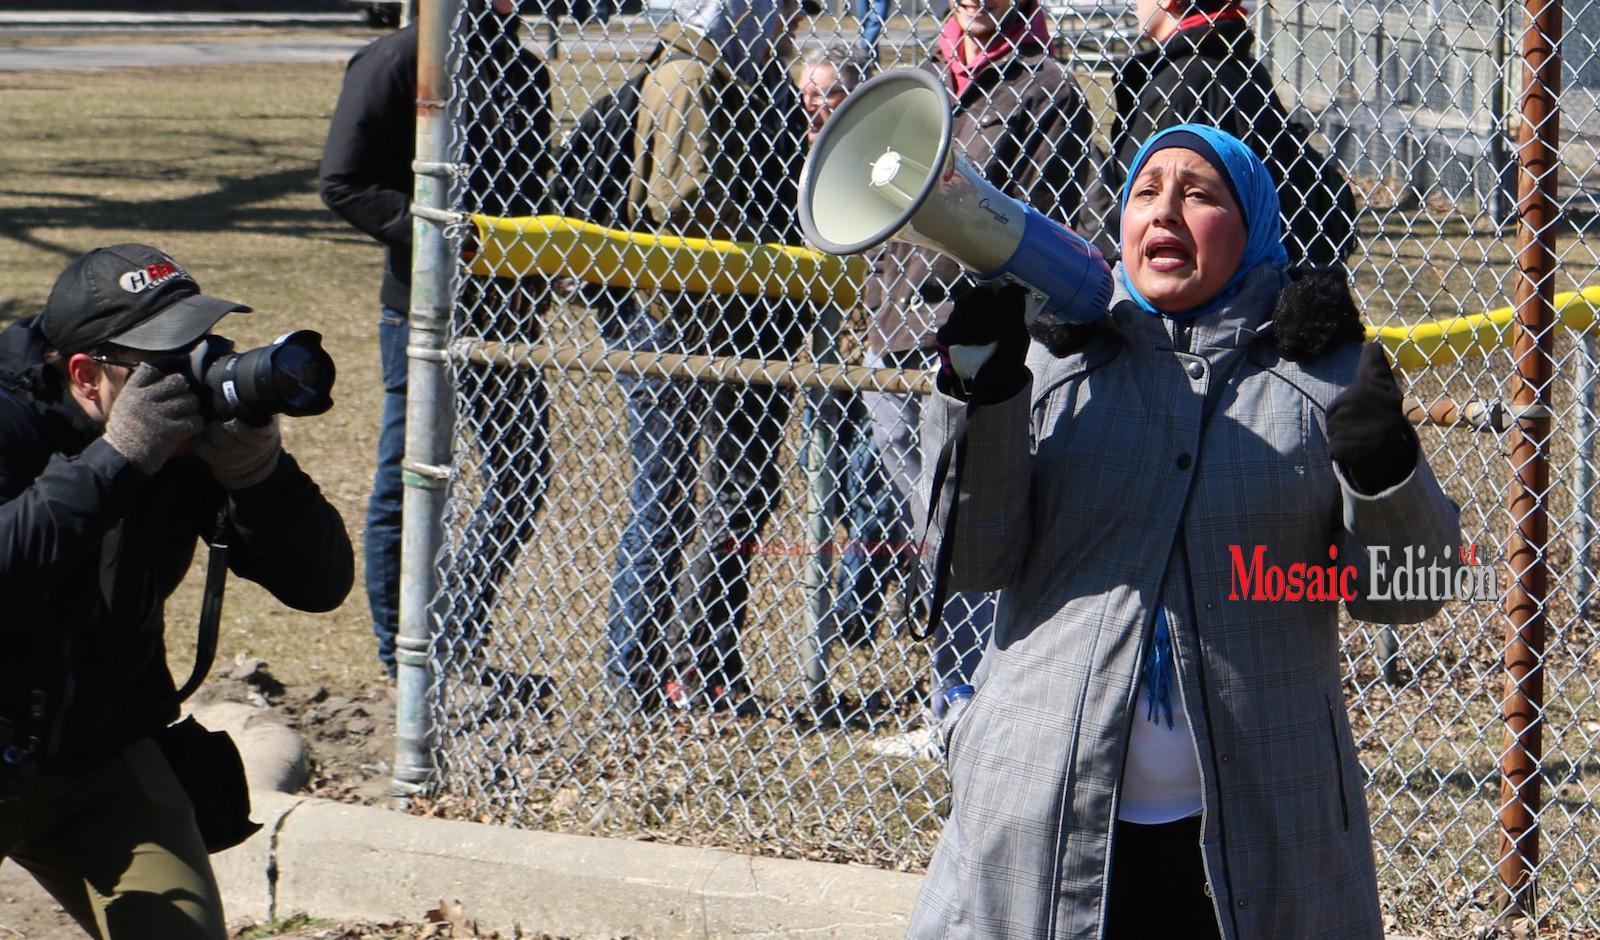 Yasmeen Mirza calls for unity - Hamilton Victoria Park - mosaicedition.ca-ea